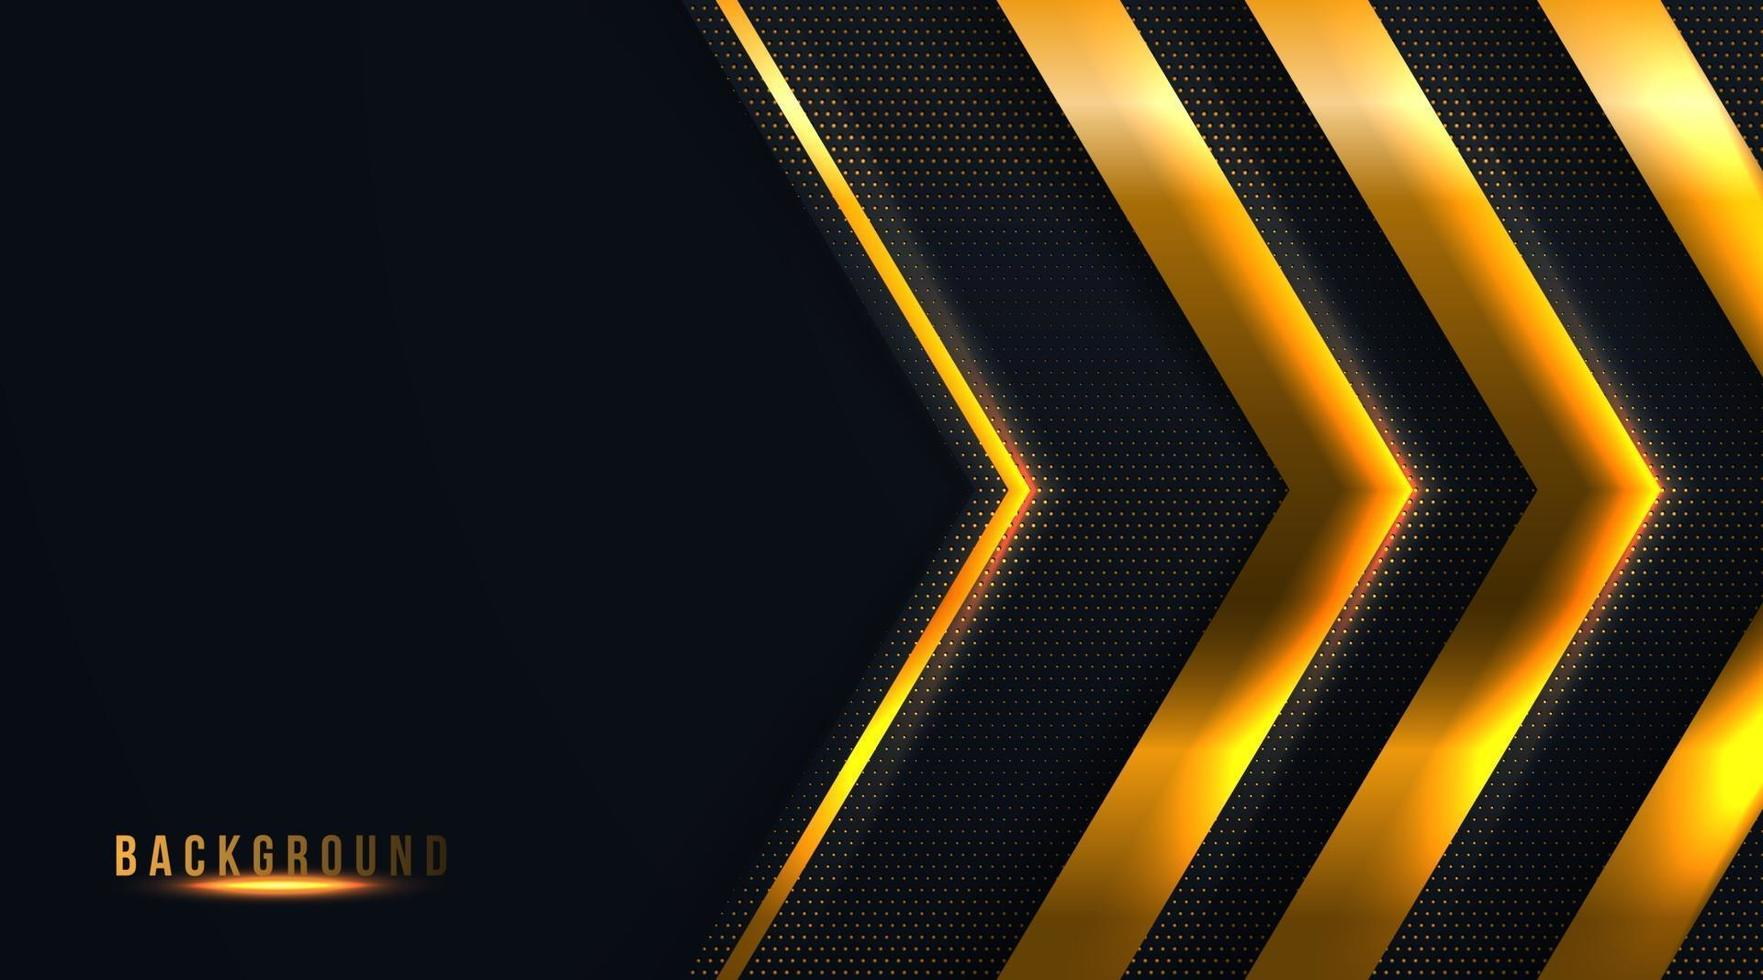 der abstrakte goldene Pfeil auf dunklem Hintergrundvektorillustration vektor